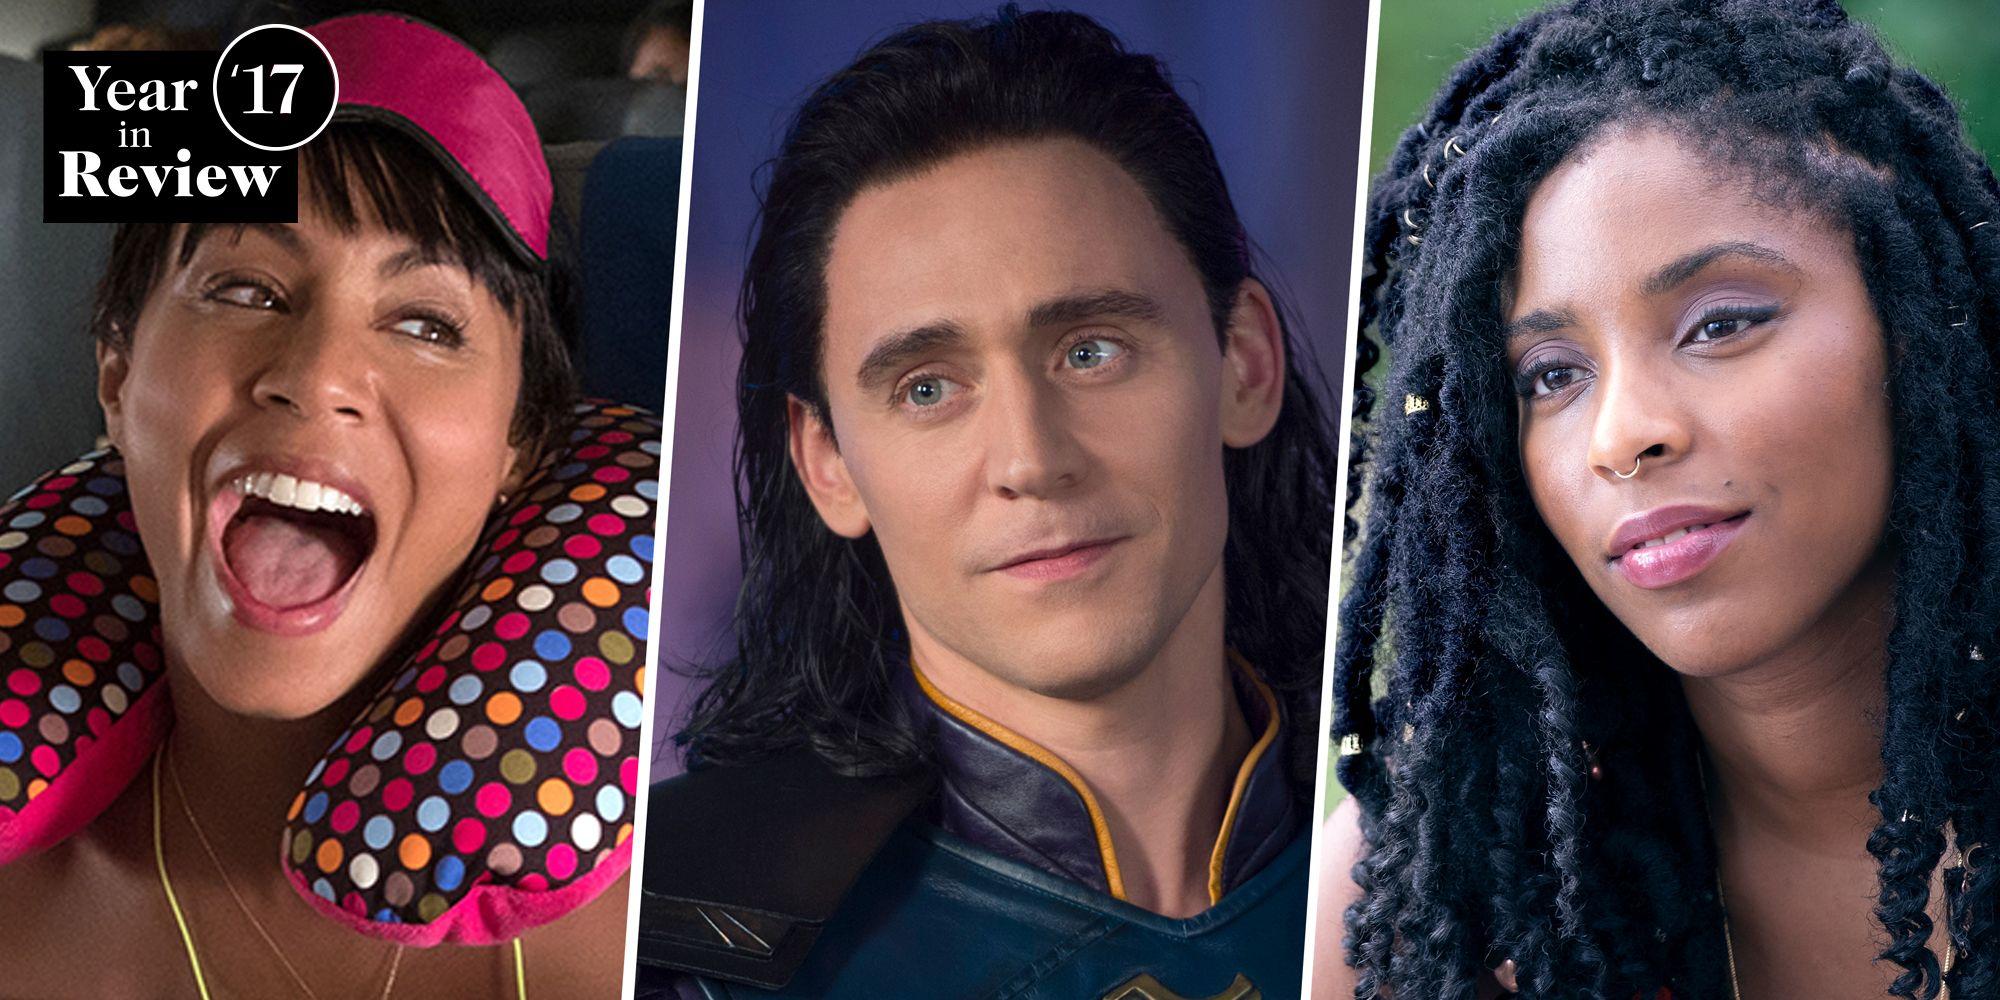 Top 10 Punto Medio Noticias   Best Drama Comedy Netflix Movies 2017